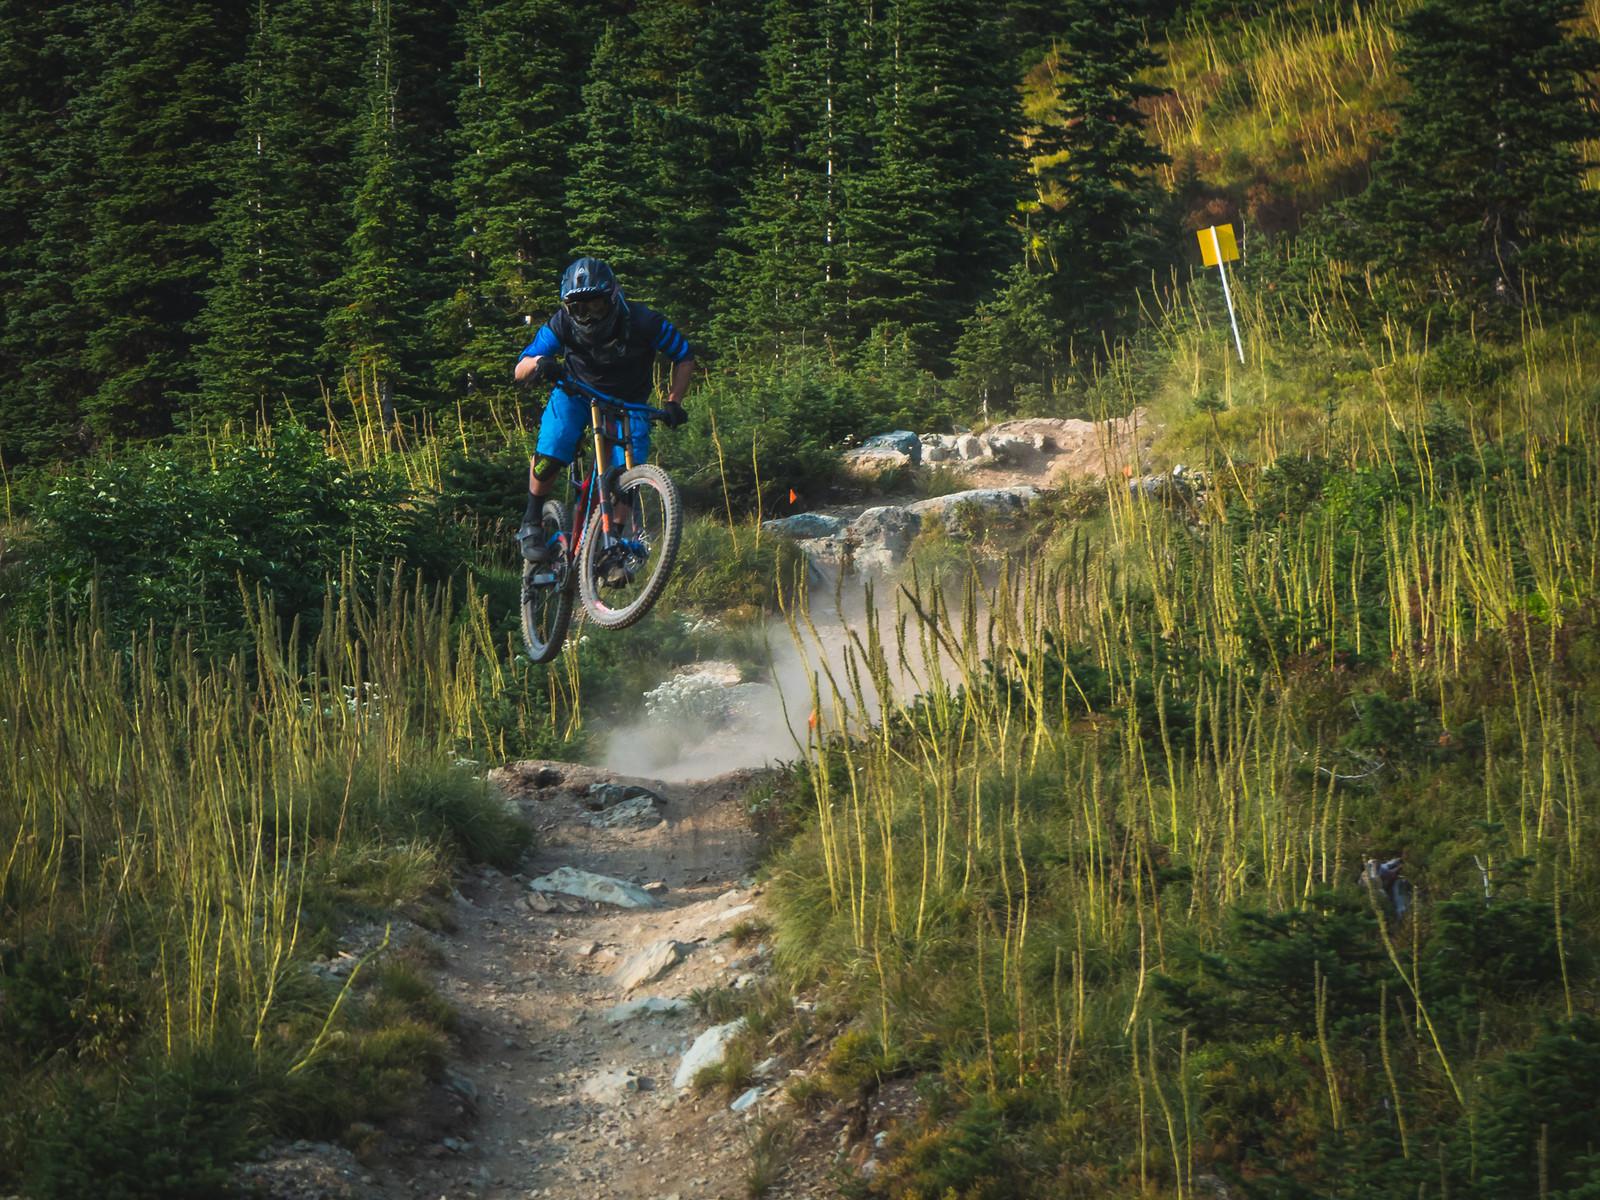 Runaway Train - marc_obrien - Mountain Biking Pictures - Vital MTB